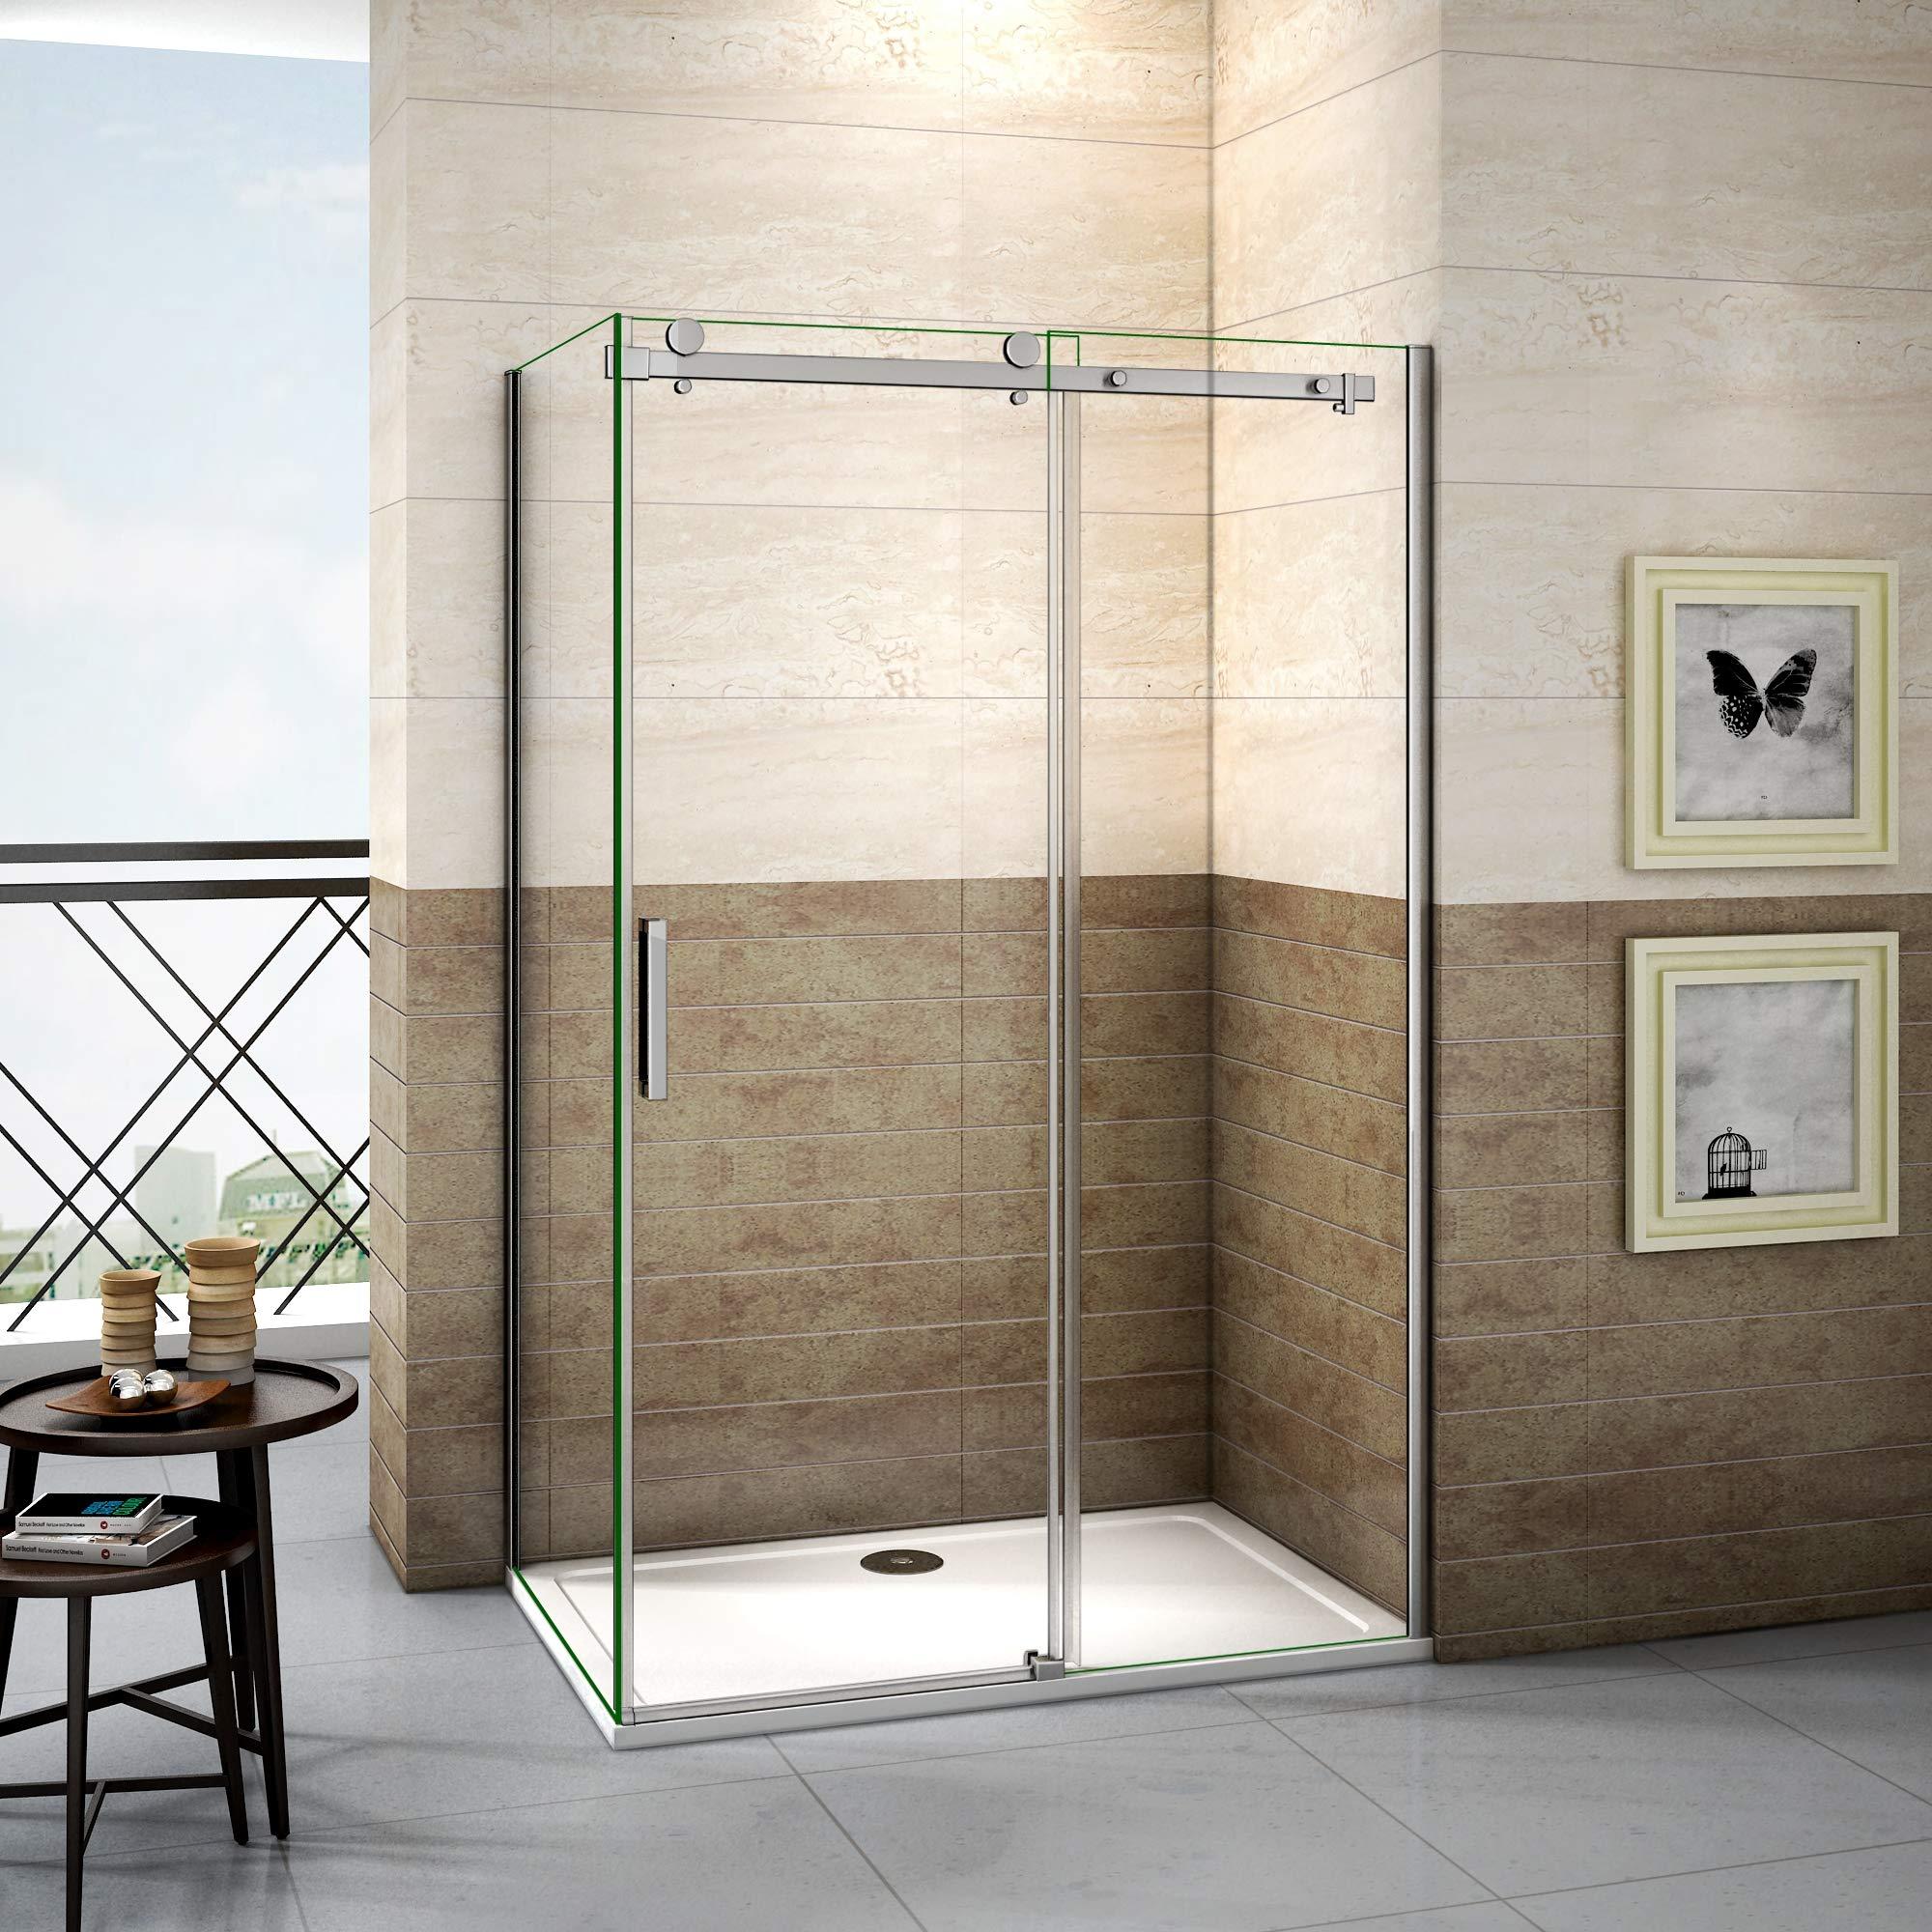 160x70x195cm Mamparas de ducha cabina de ducha 8mm vidrio templado ...